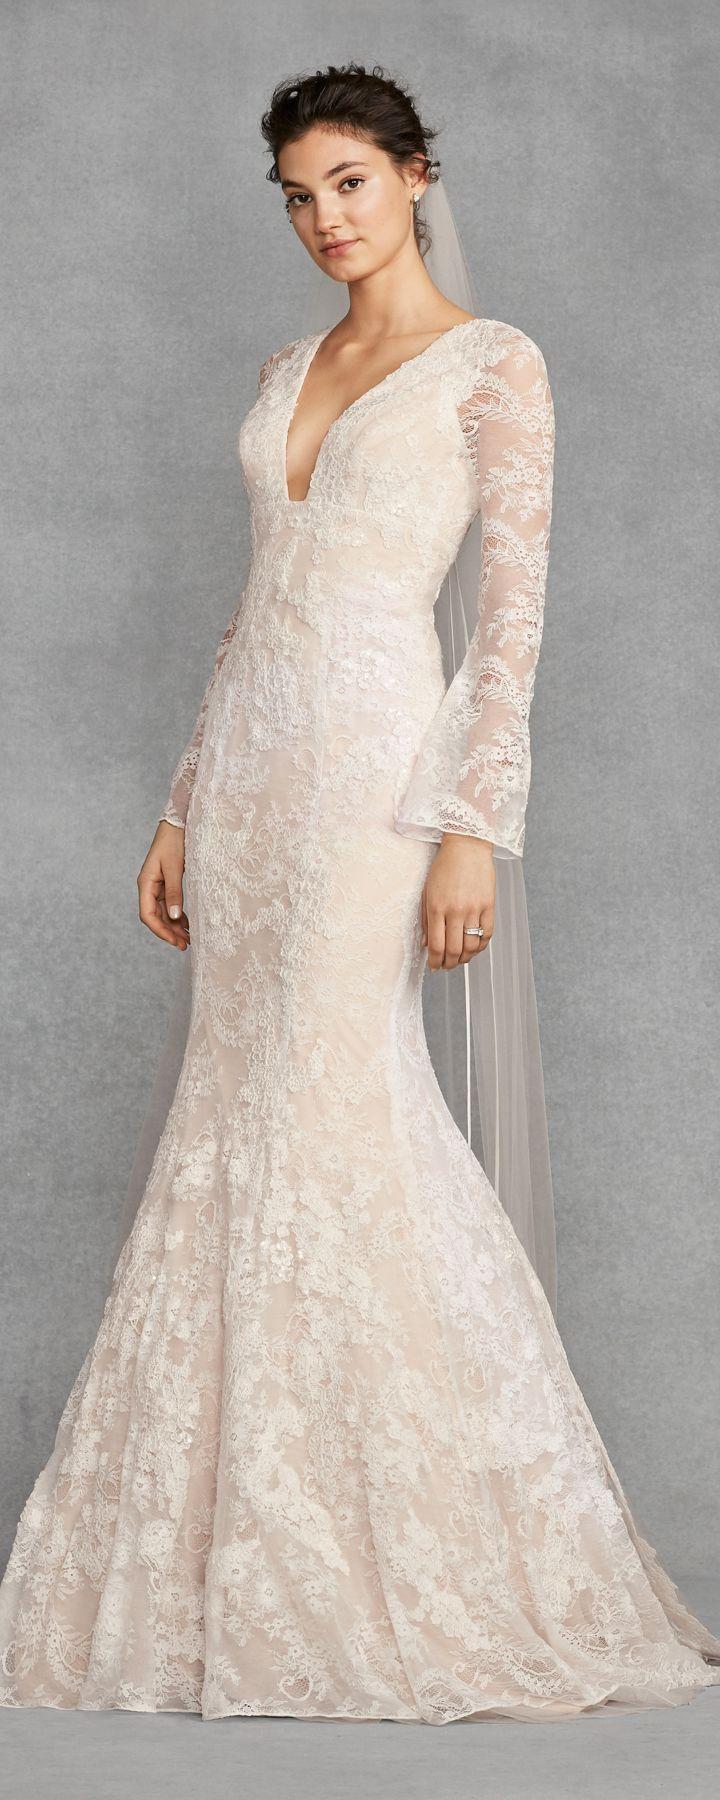 Lace Wedding Dresses Vera Wang